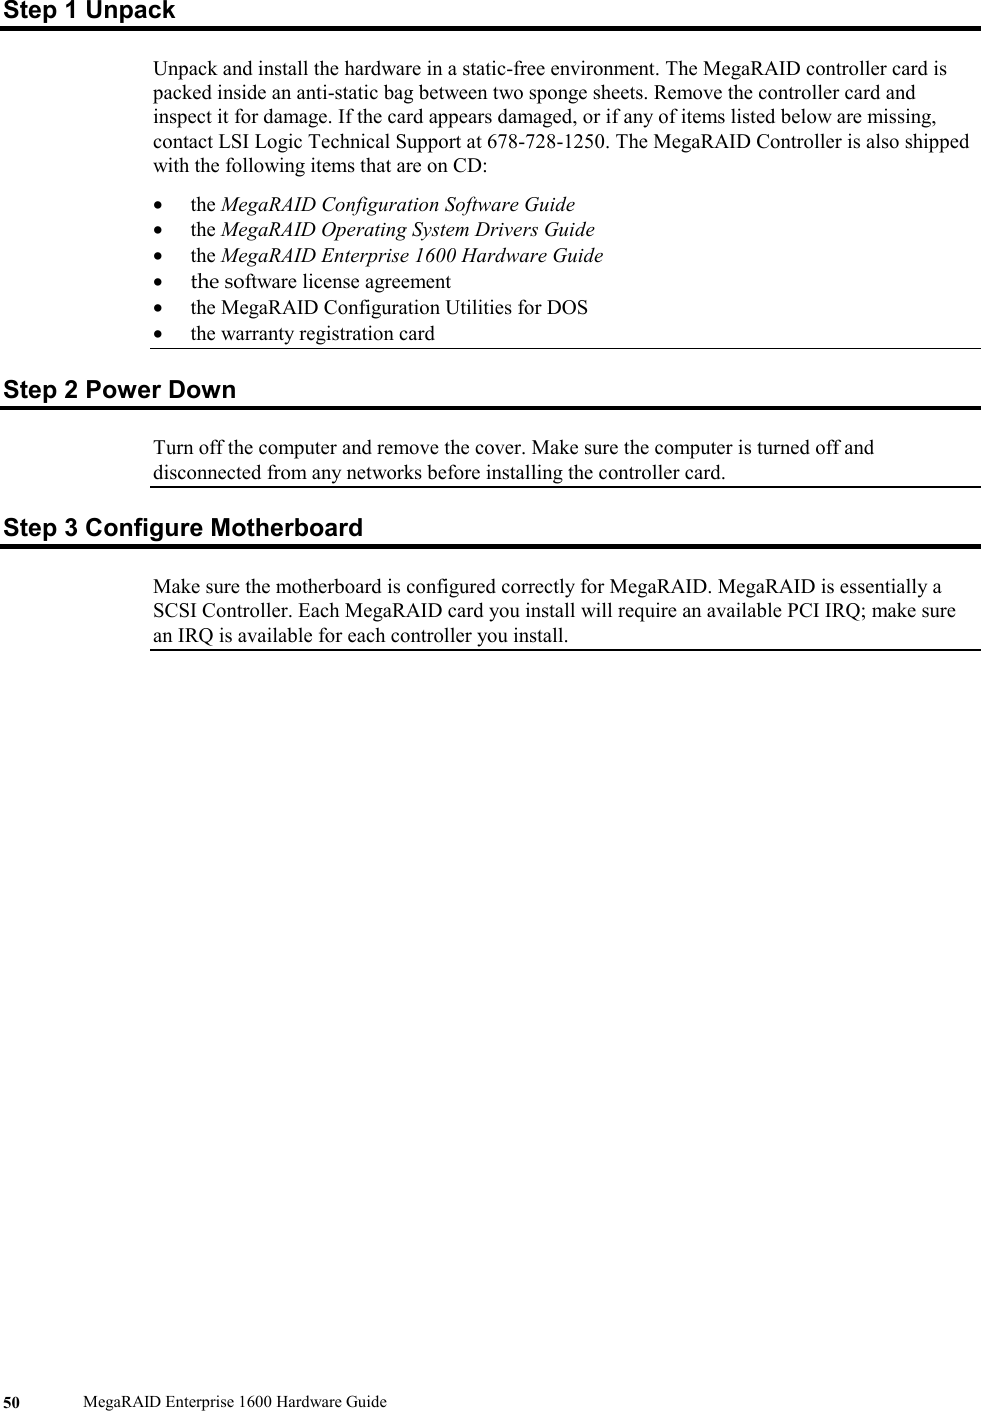 Lsi Megaraid Enterprise 1600 Users Manual 1600